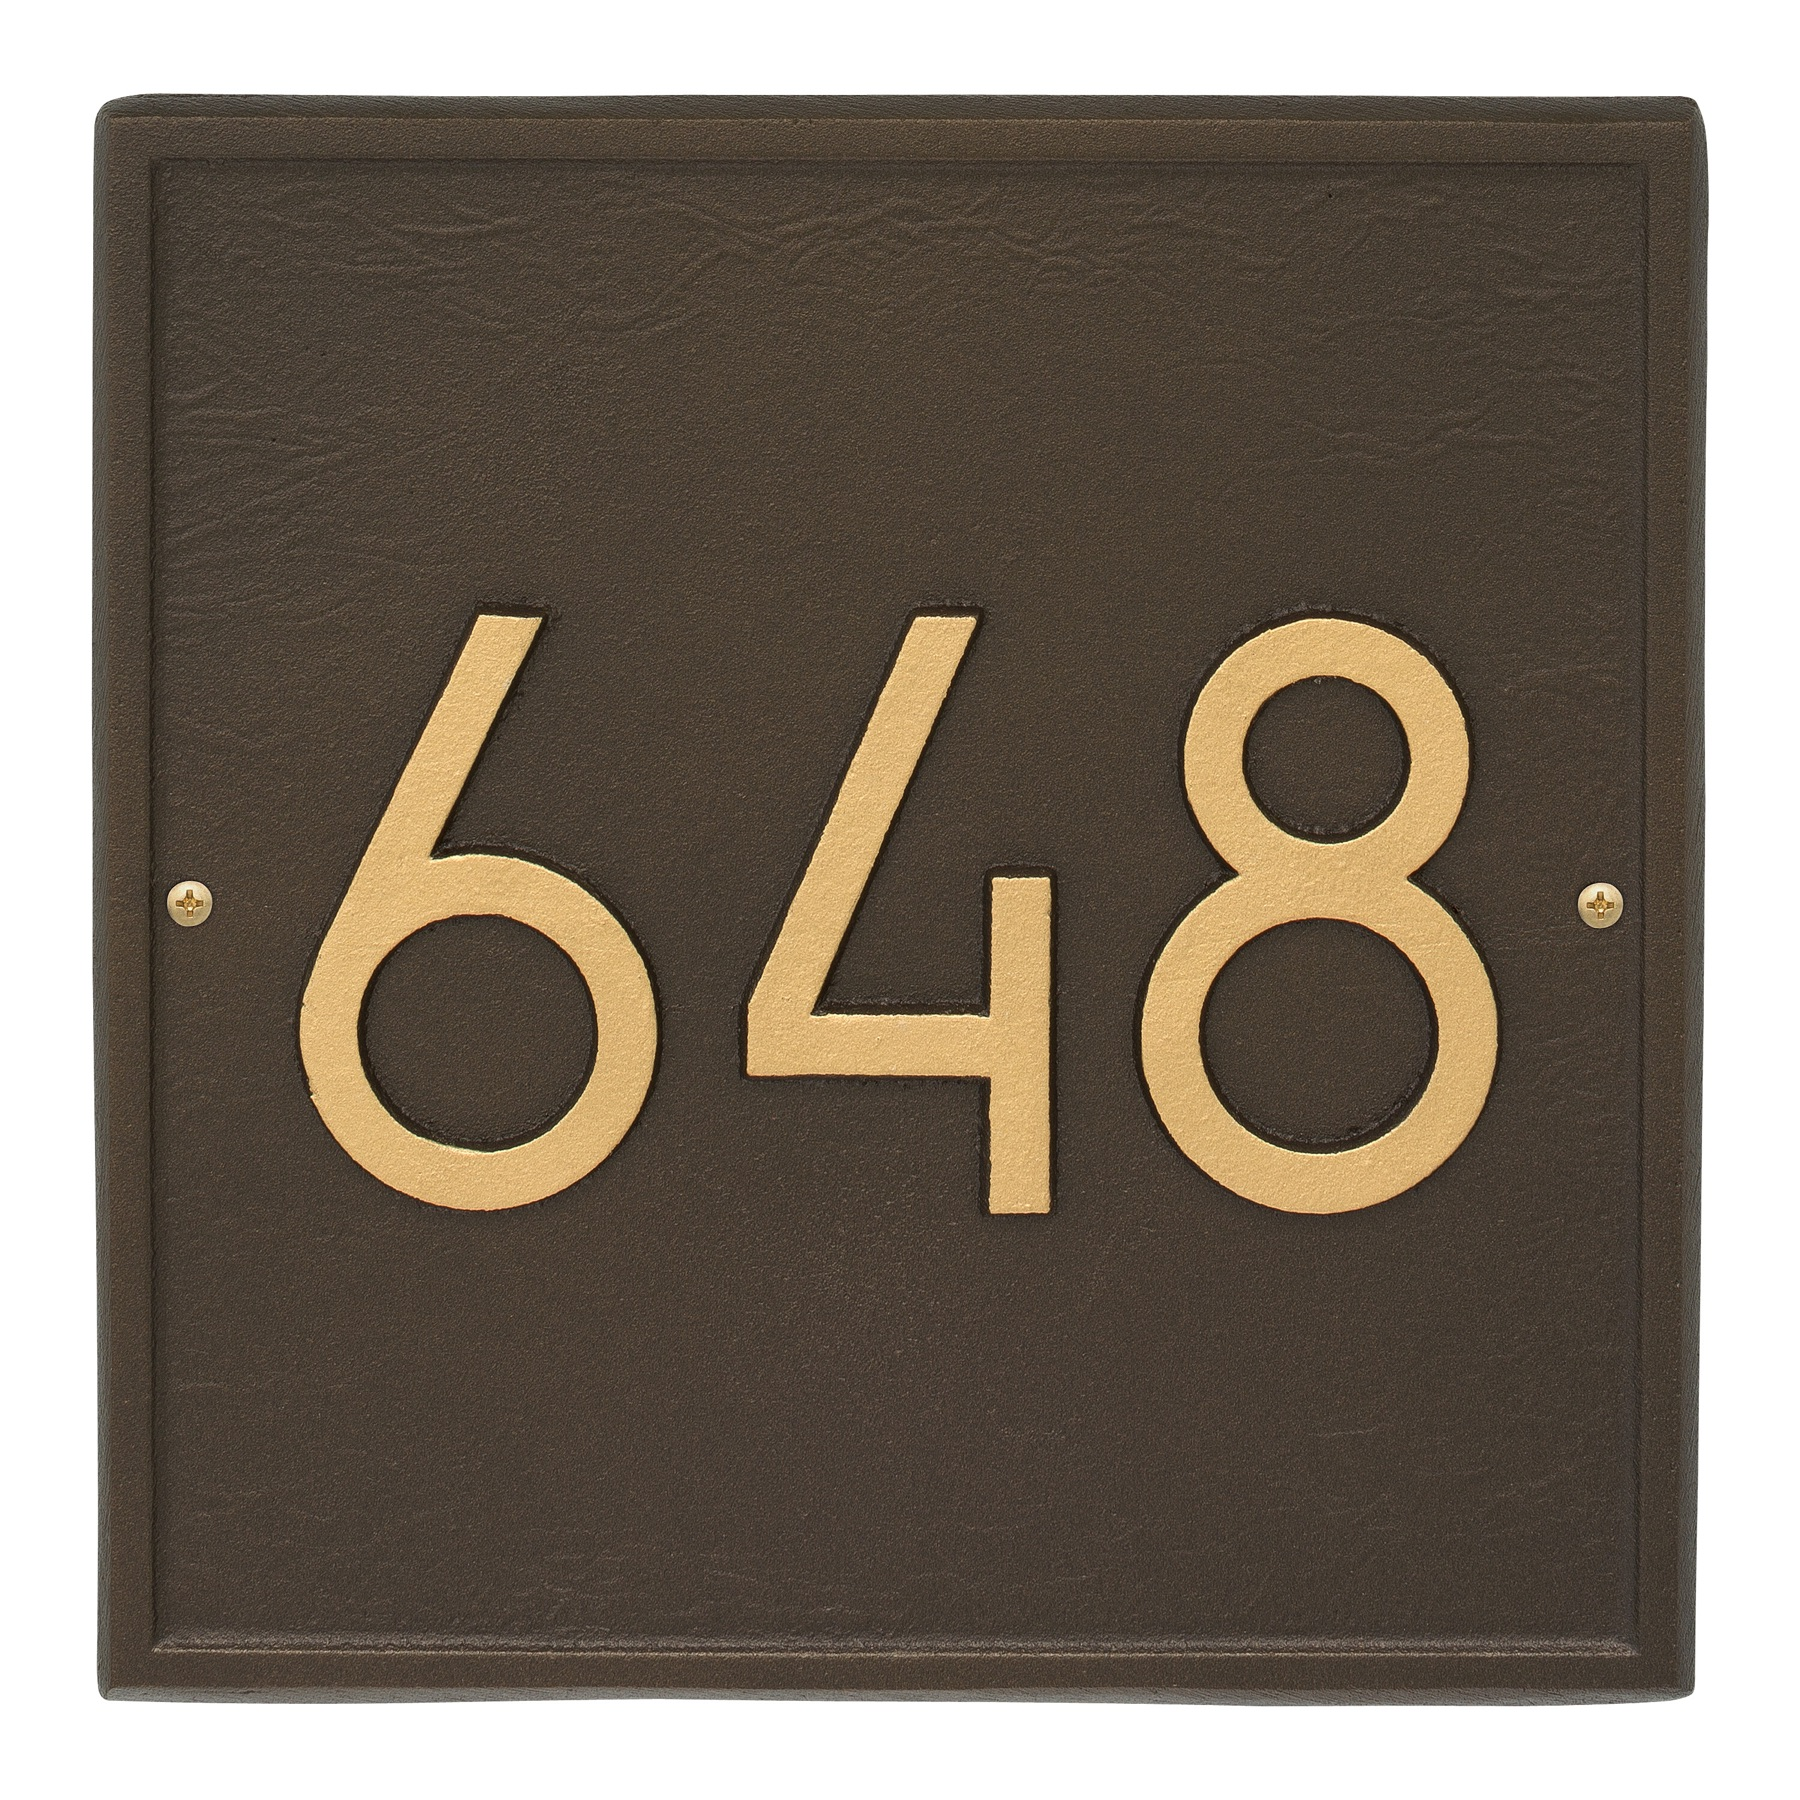 square modern address plaque wall. Black Bedroom Furniture Sets. Home Design Ideas